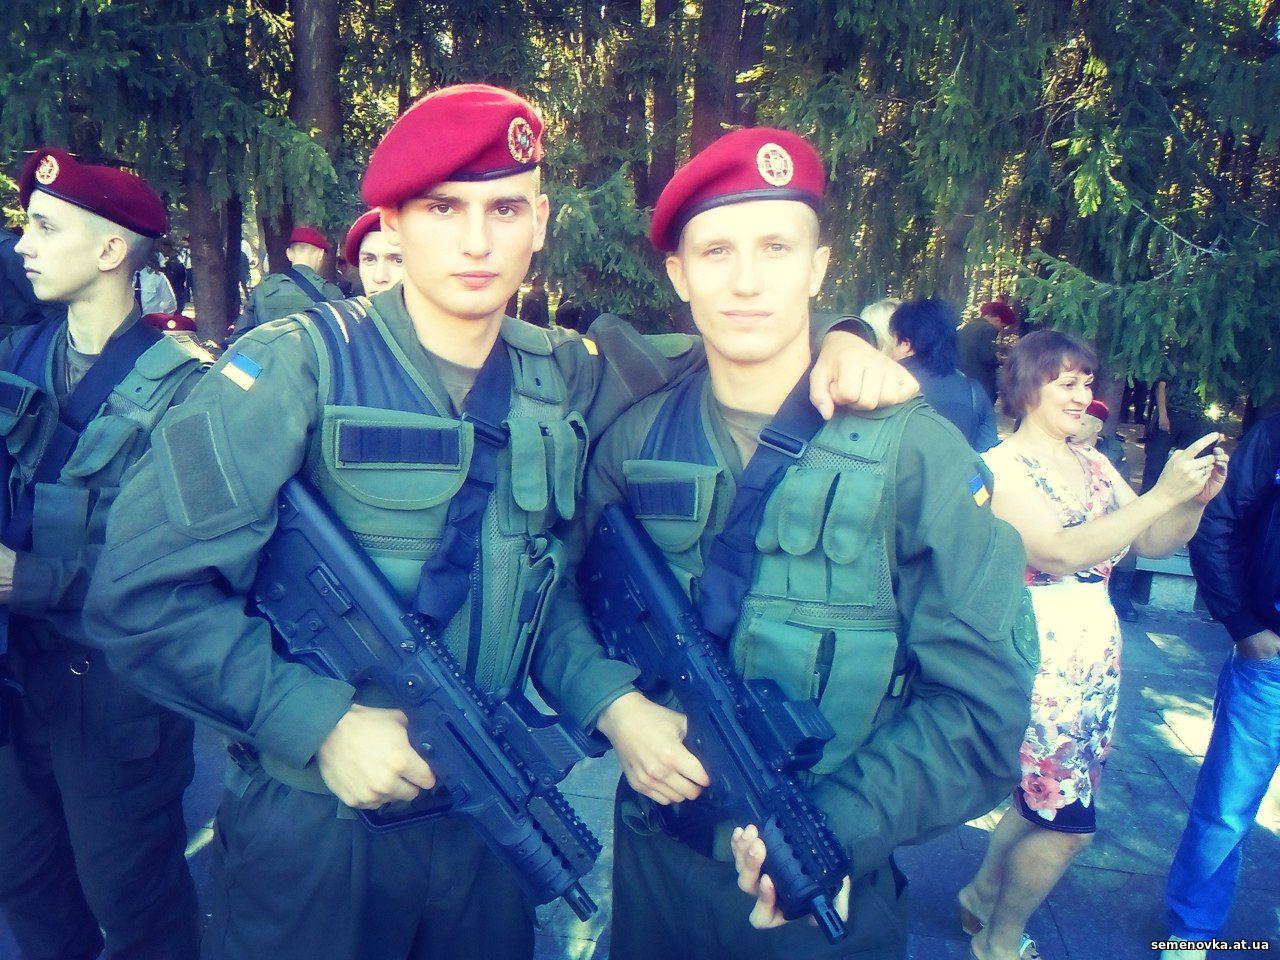 Даниїл Горєлий, курсант (справа) зі своїм однокурсником